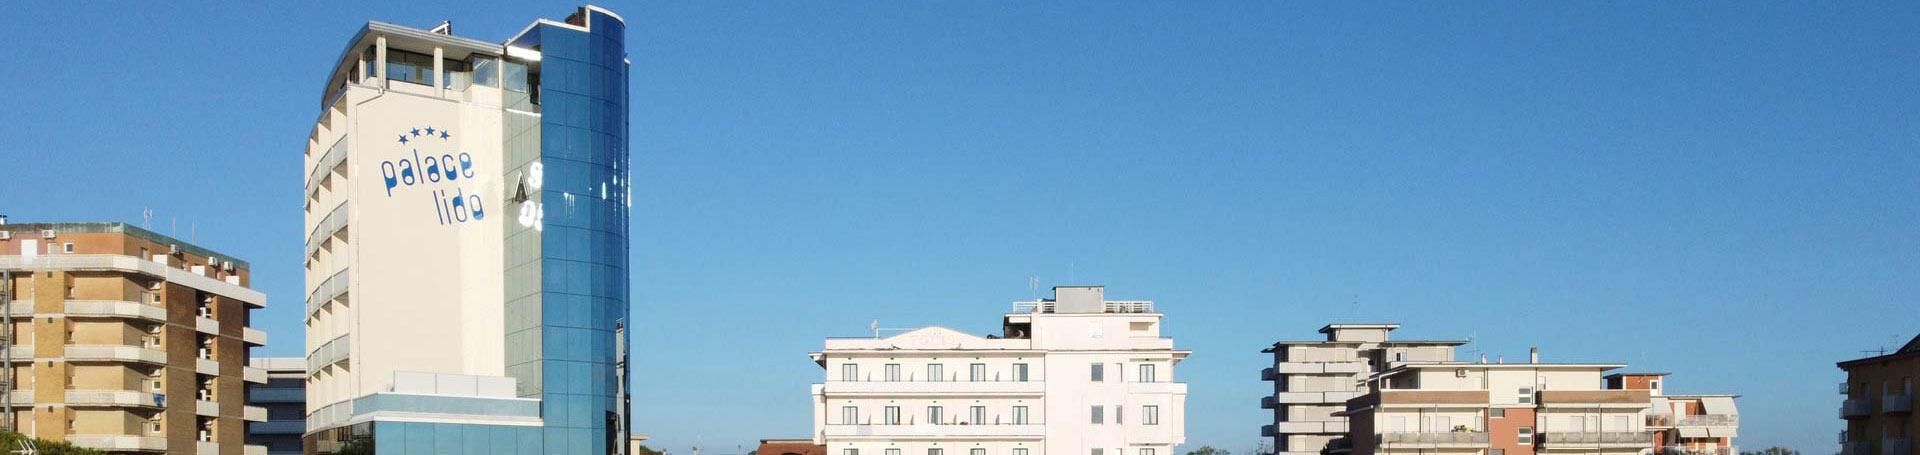 palacelidohotel de hotel-lido-di-savio 011